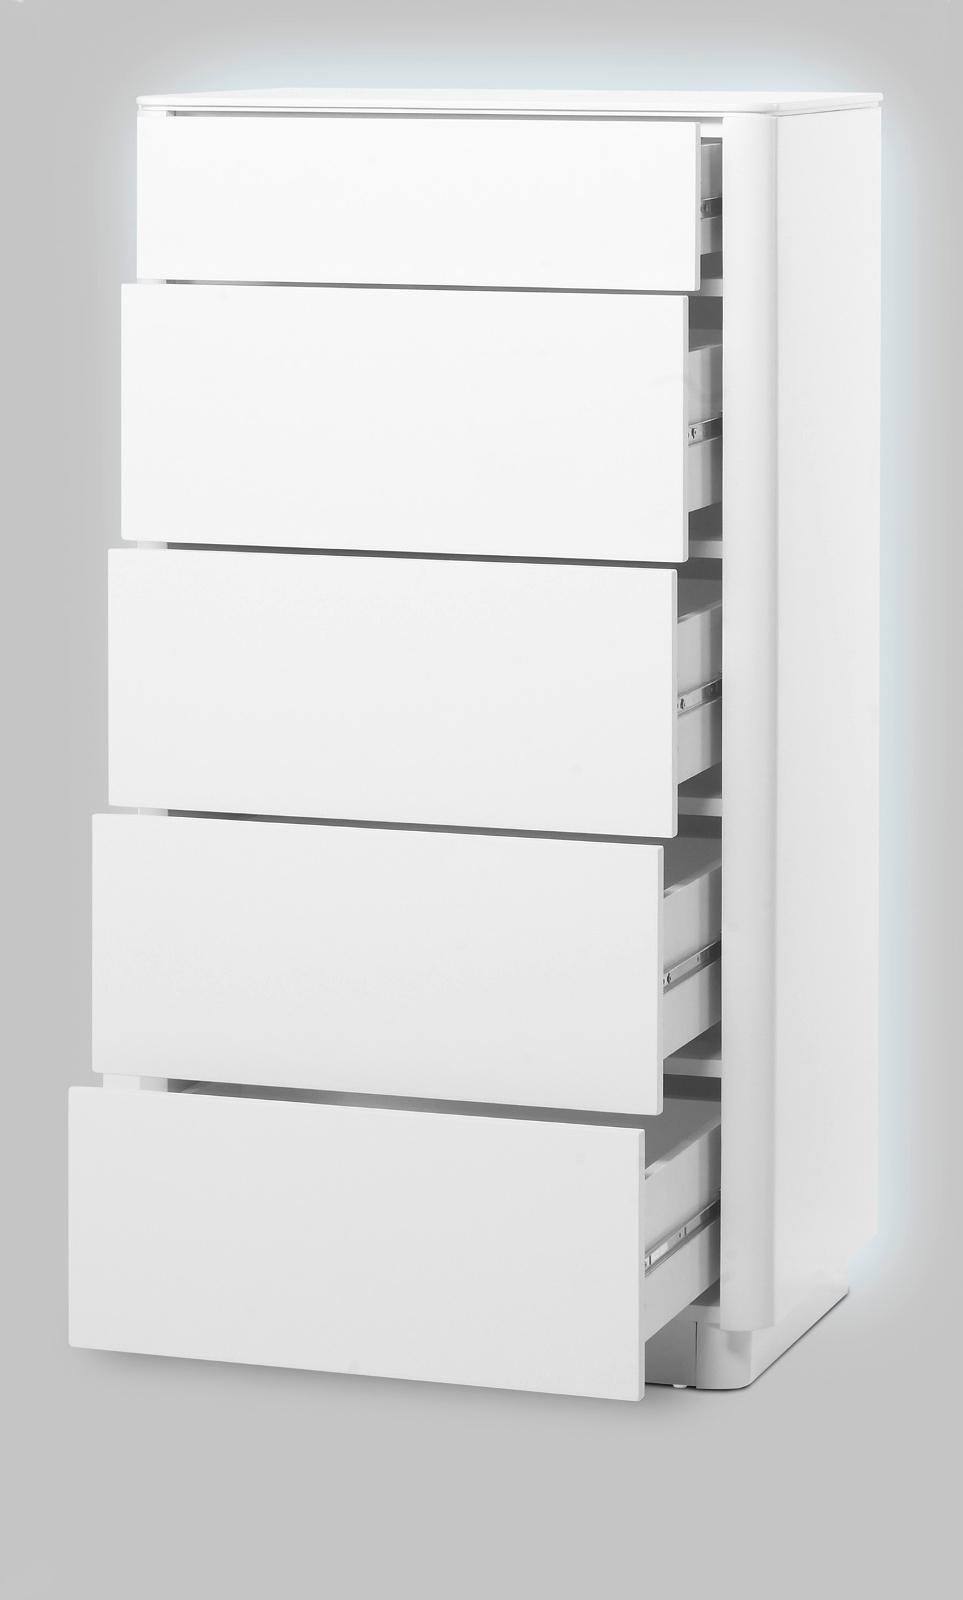 Kommode menton matt wei lack 60 cm for Kommode 100 x 60